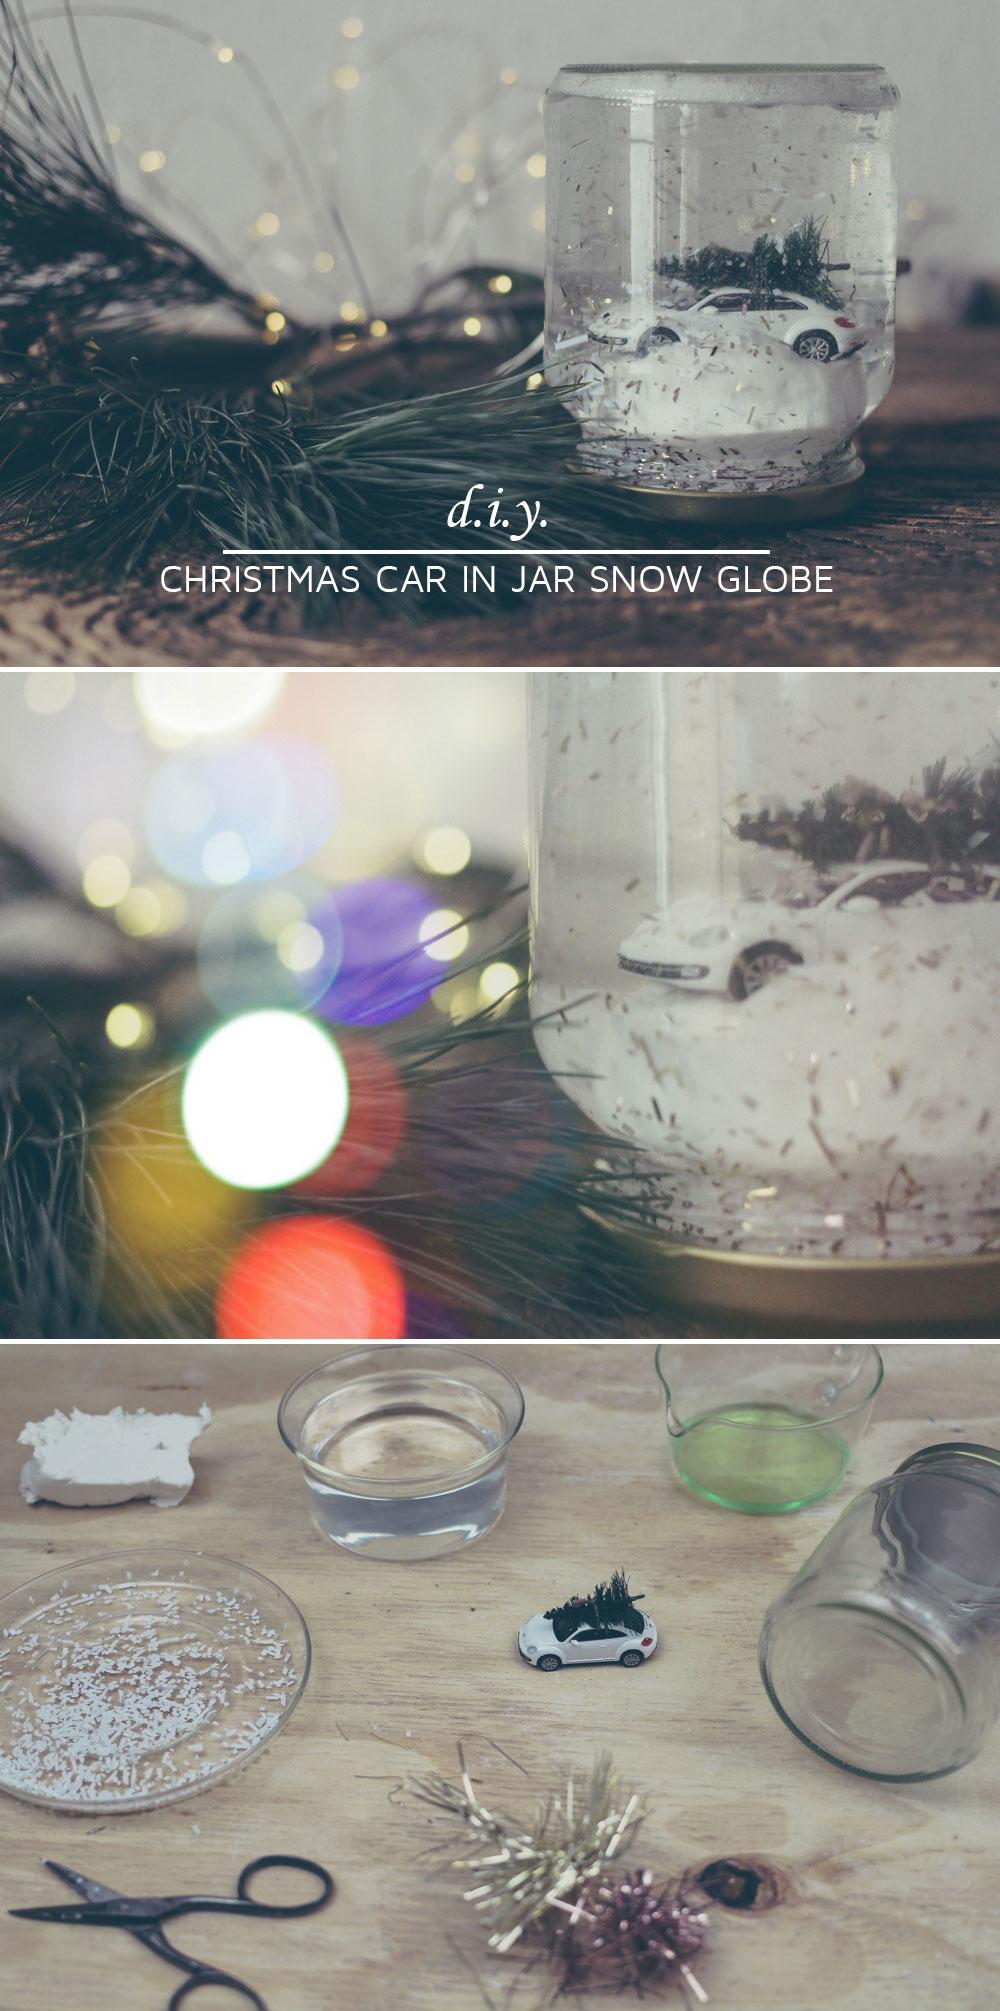 diy jar snow globe diy schneekugel mit modellauto n hmarie. Black Bedroom Furniture Sets. Home Design Ideas